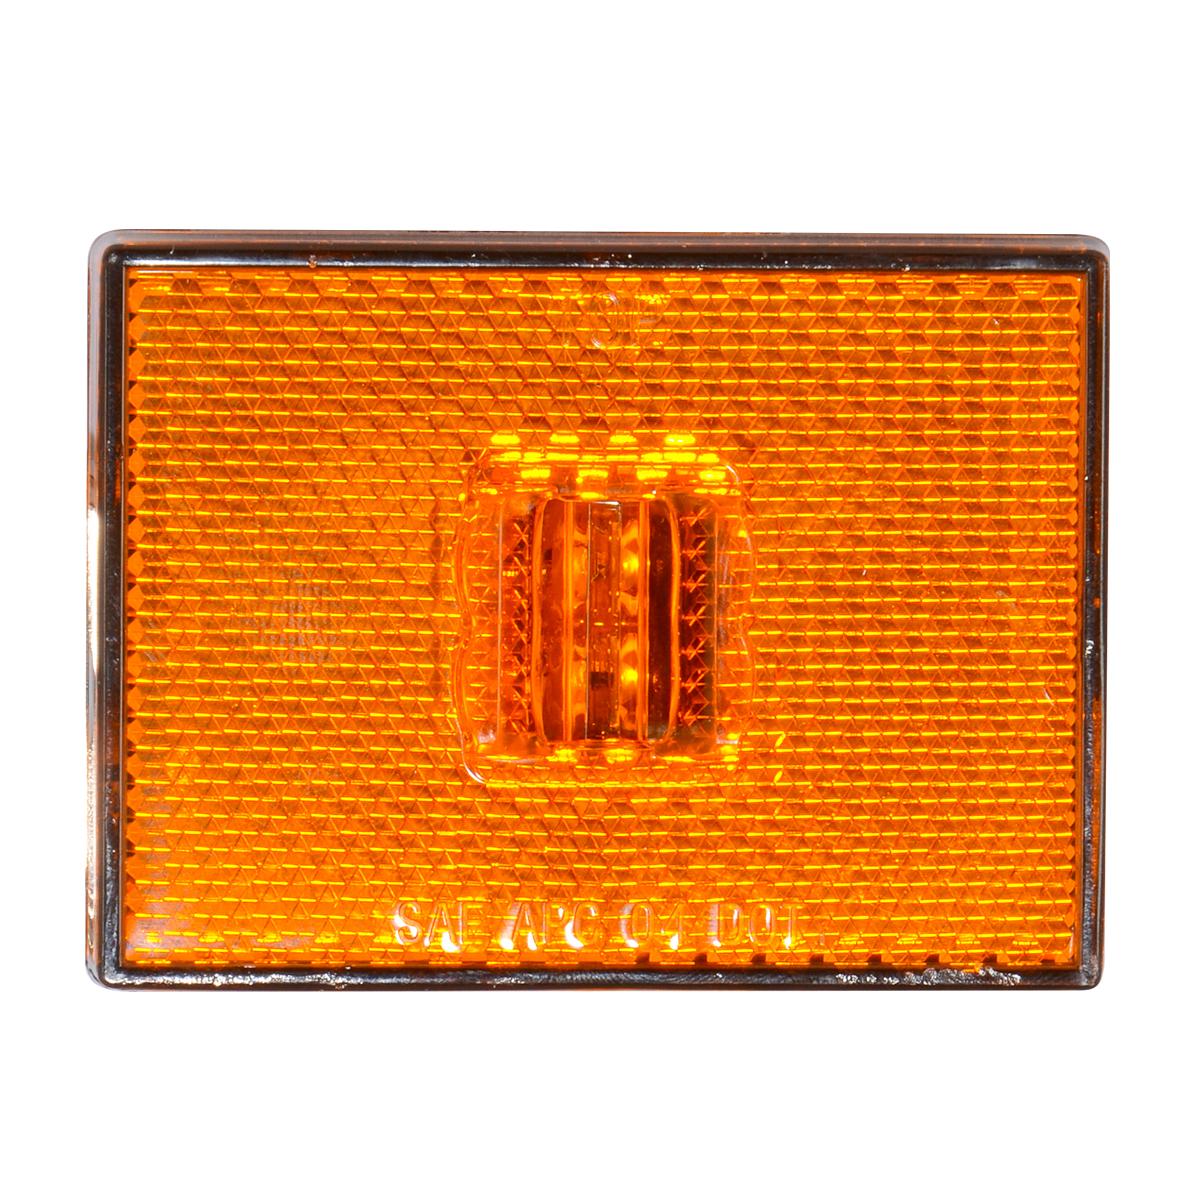 78380 Rectangular Stud Mount LED Marker Light with Reflector Lens